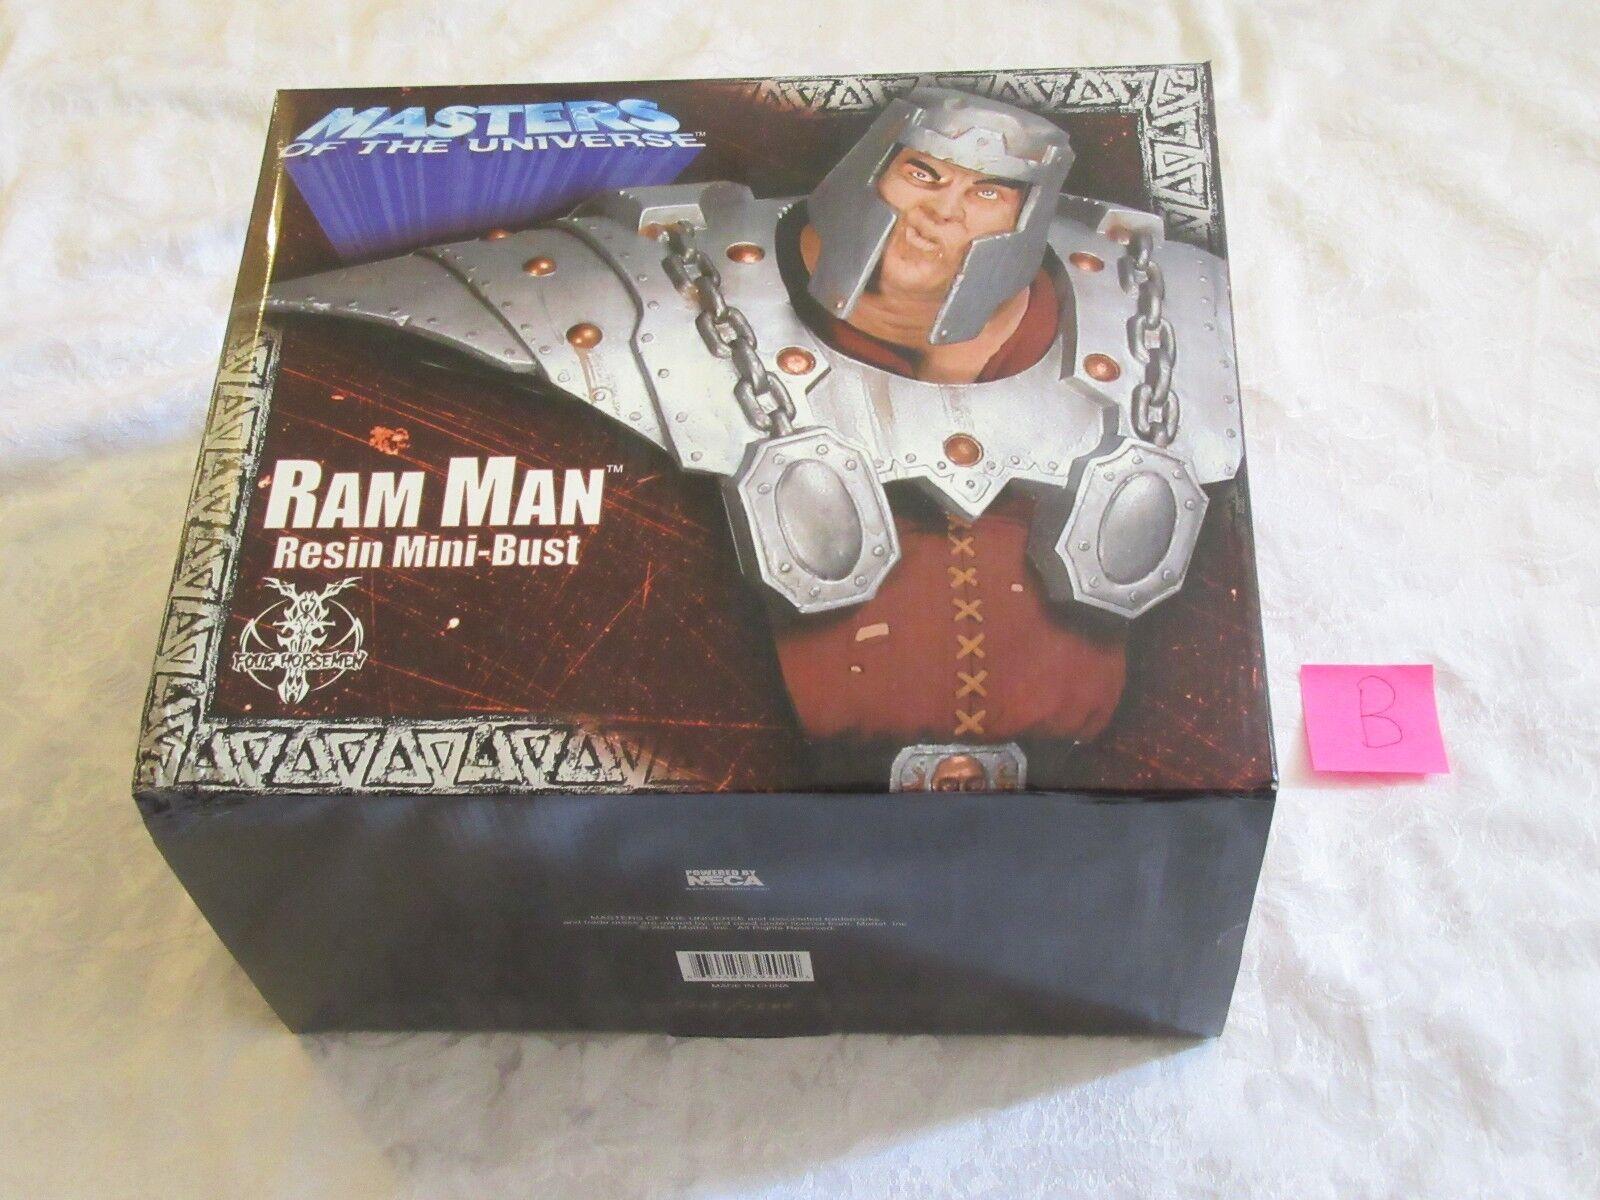 Neca Masters of the Universe MOTU Ram Man Resin Mini Bust Statue B  1705/2500